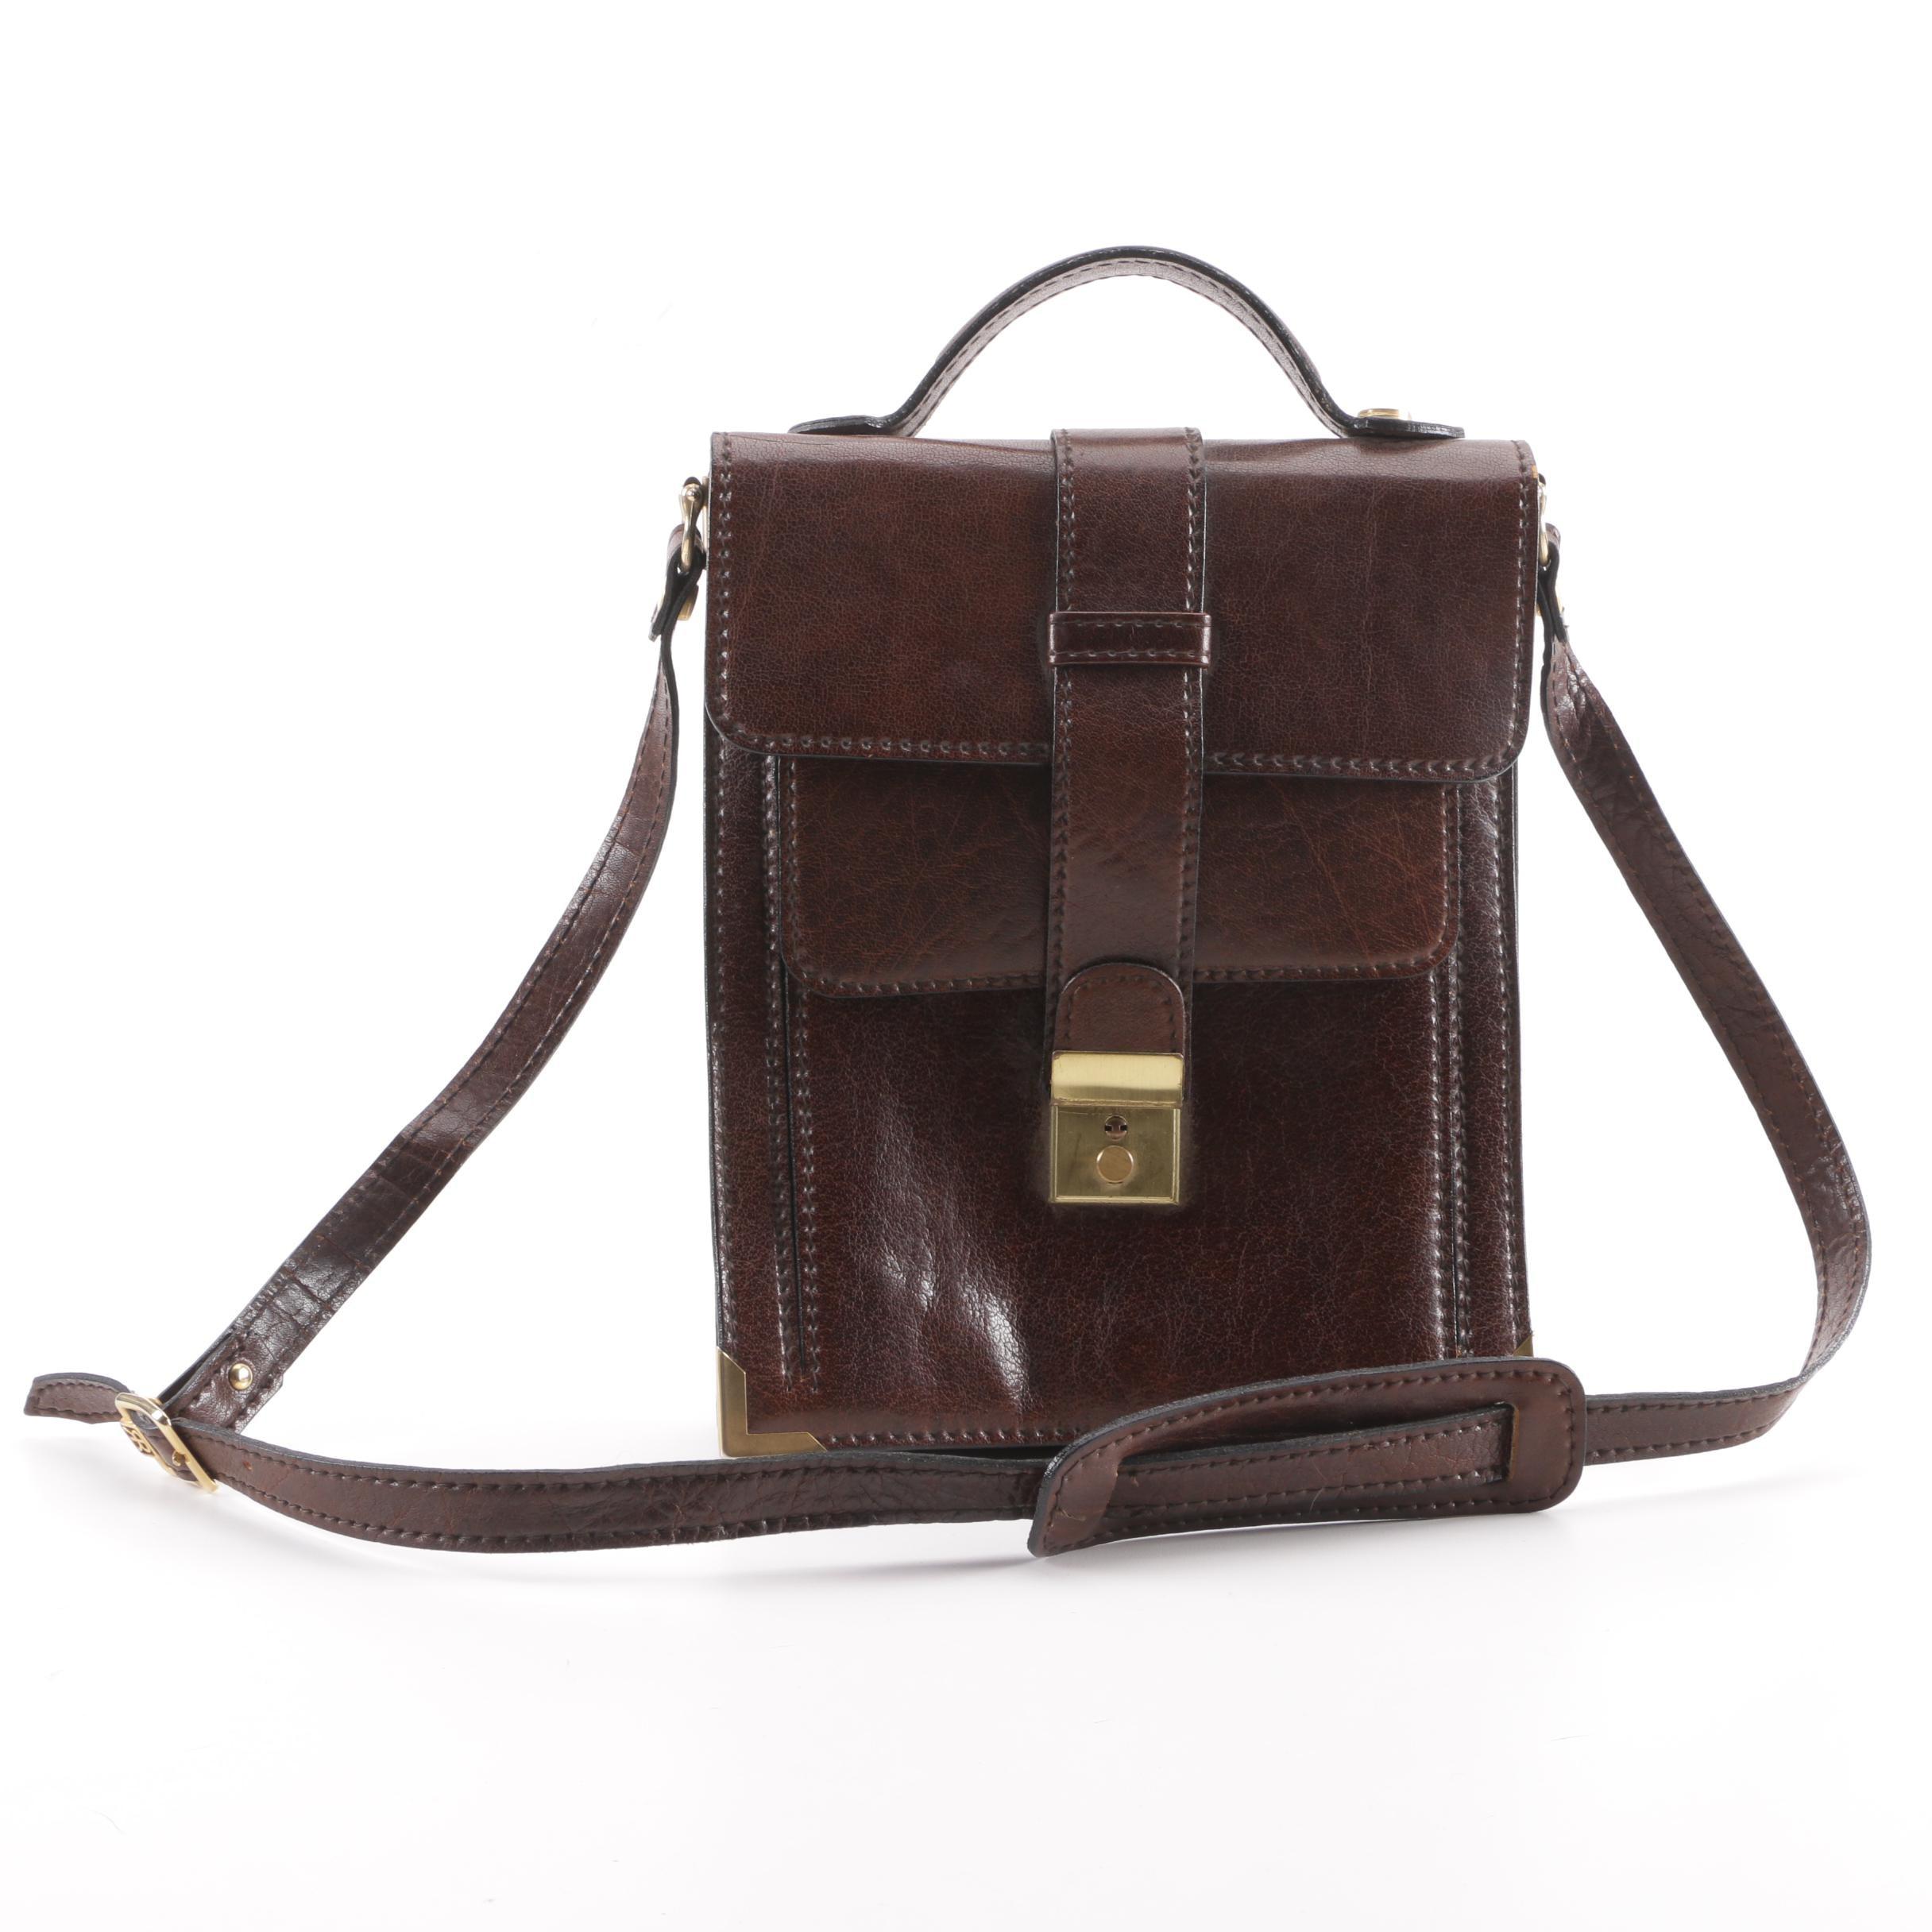 Circa 1970s Vintage RR Brown Leather Flap Front Handbag